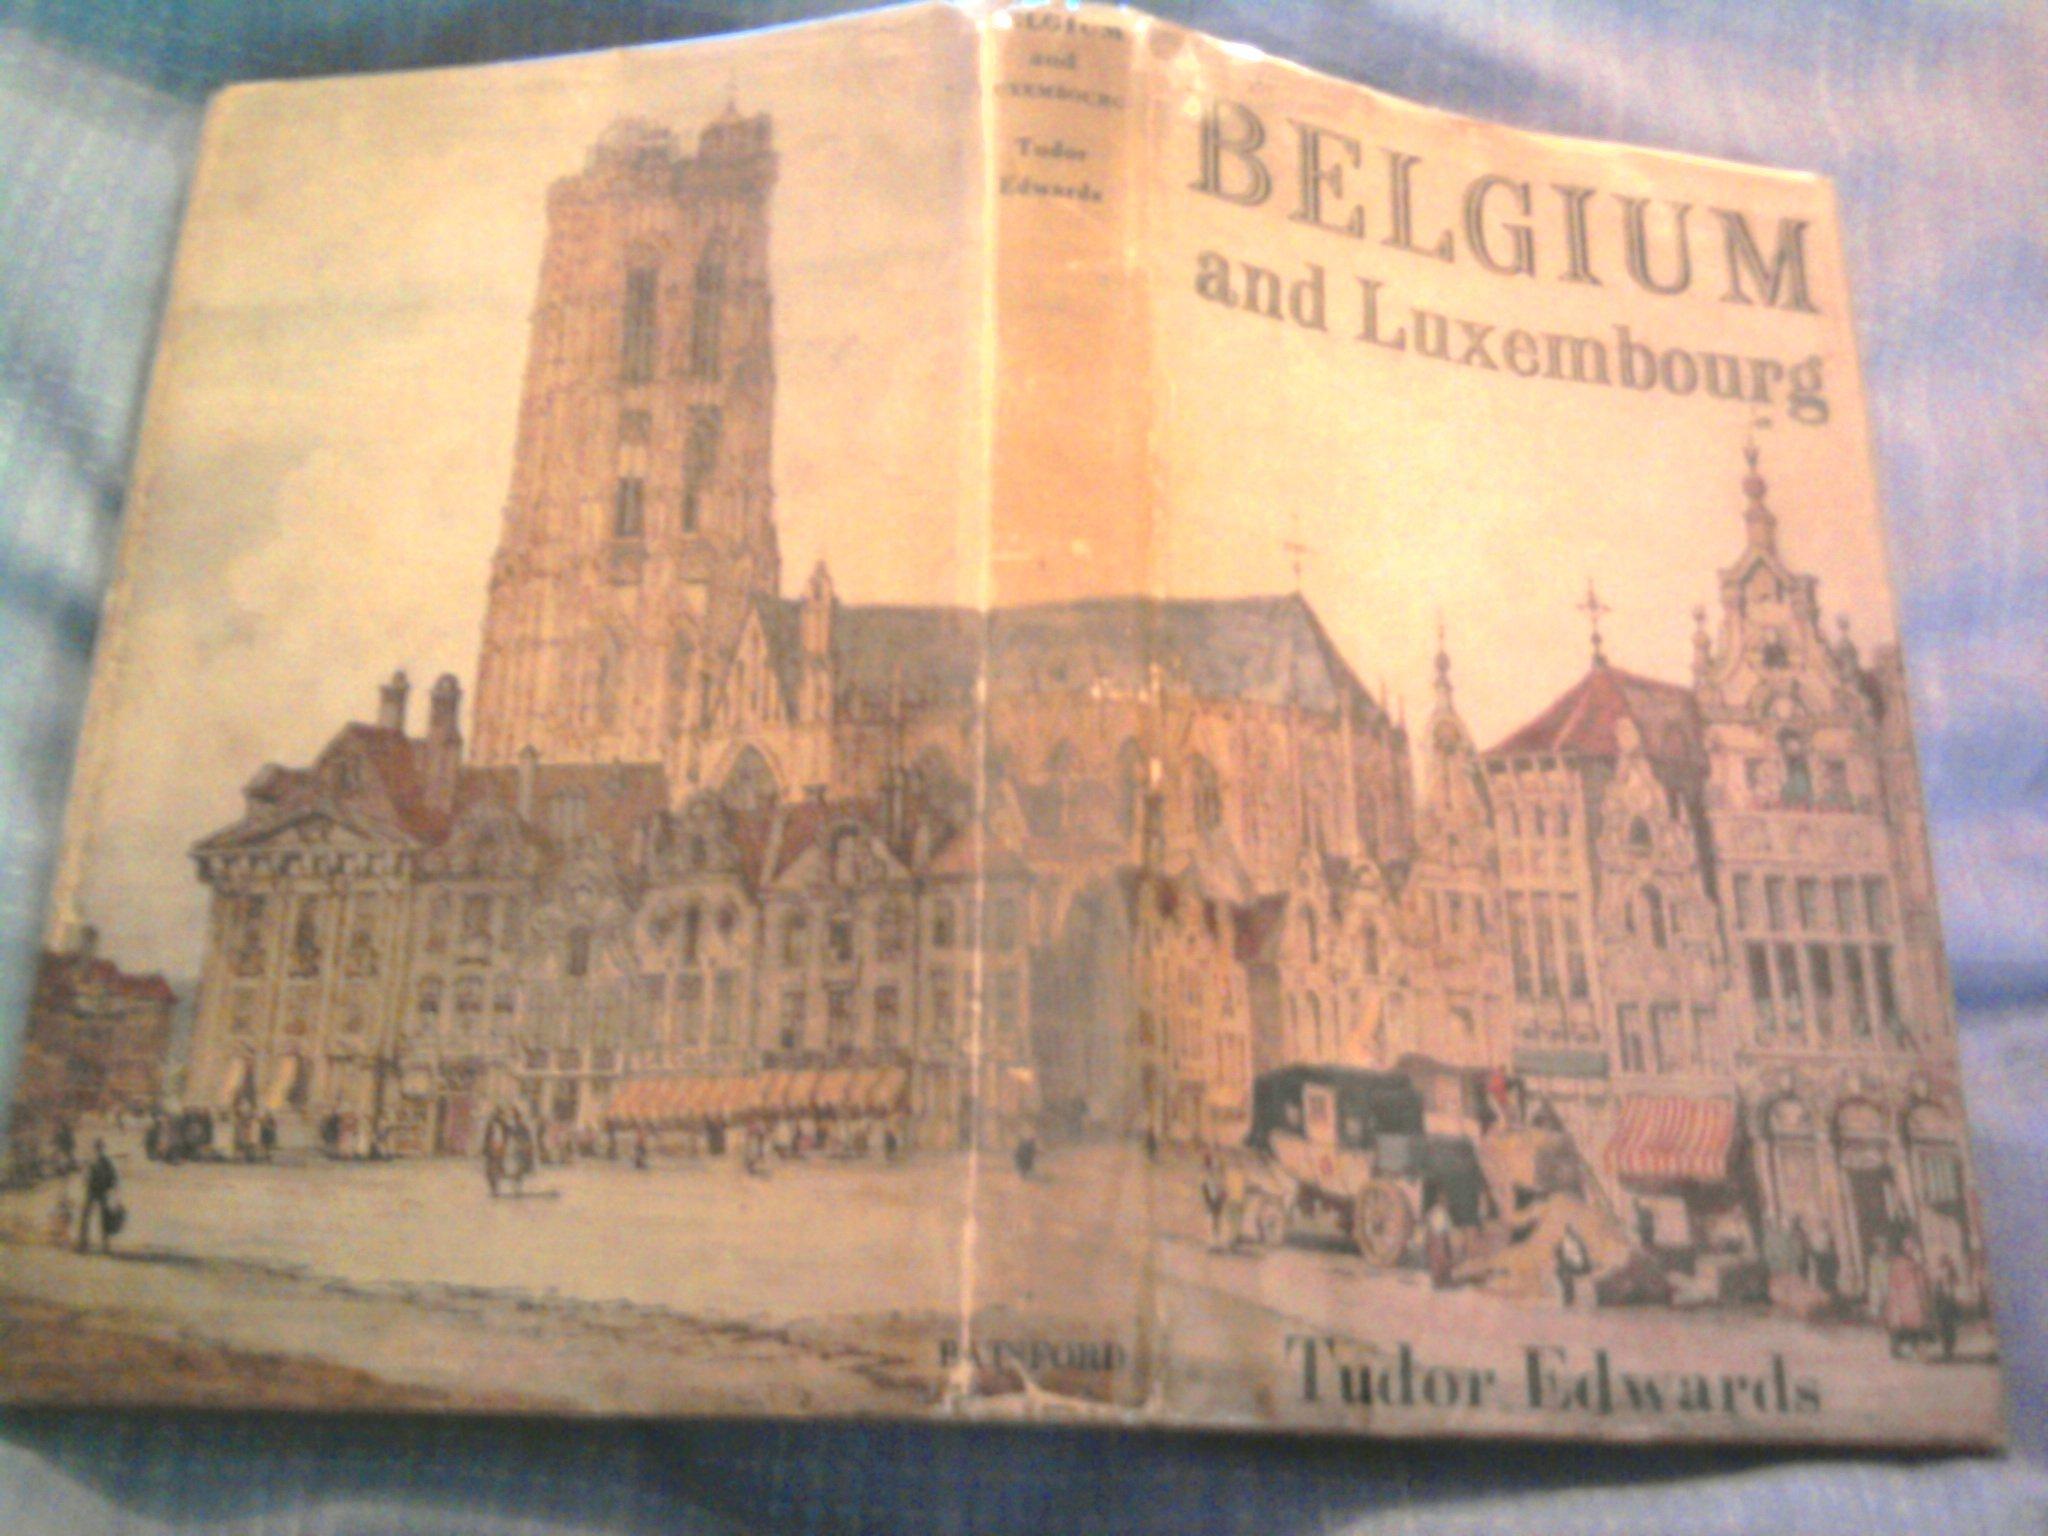 Belgium and Luxembourg (A Rand McNally pocket guide) Hardcover – 1951 Tudor Edwards Batsford B0007E3Y2U Belgique